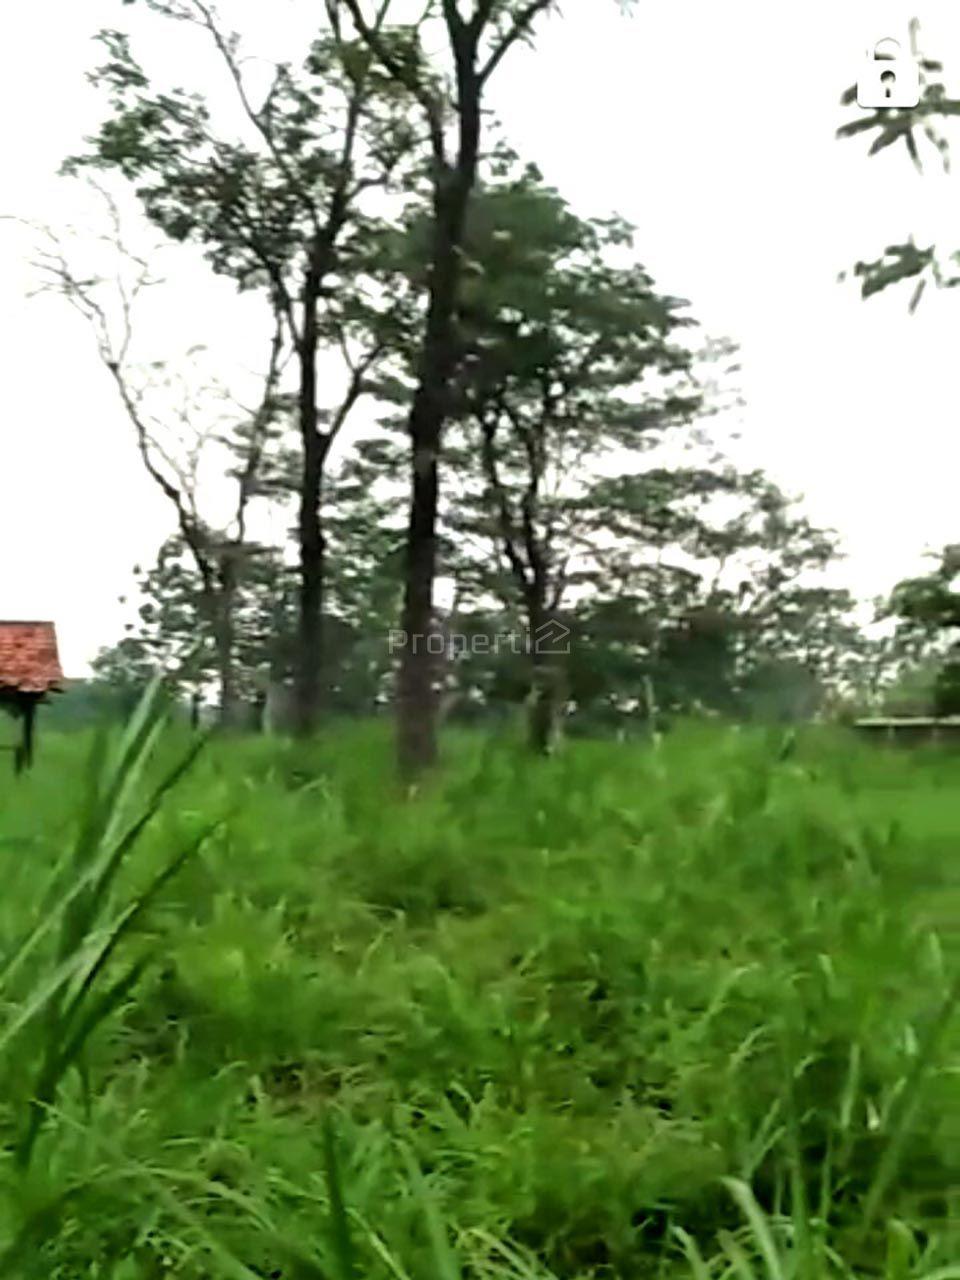 Lahan Investasi di Cibungbulang, Jawa Barat